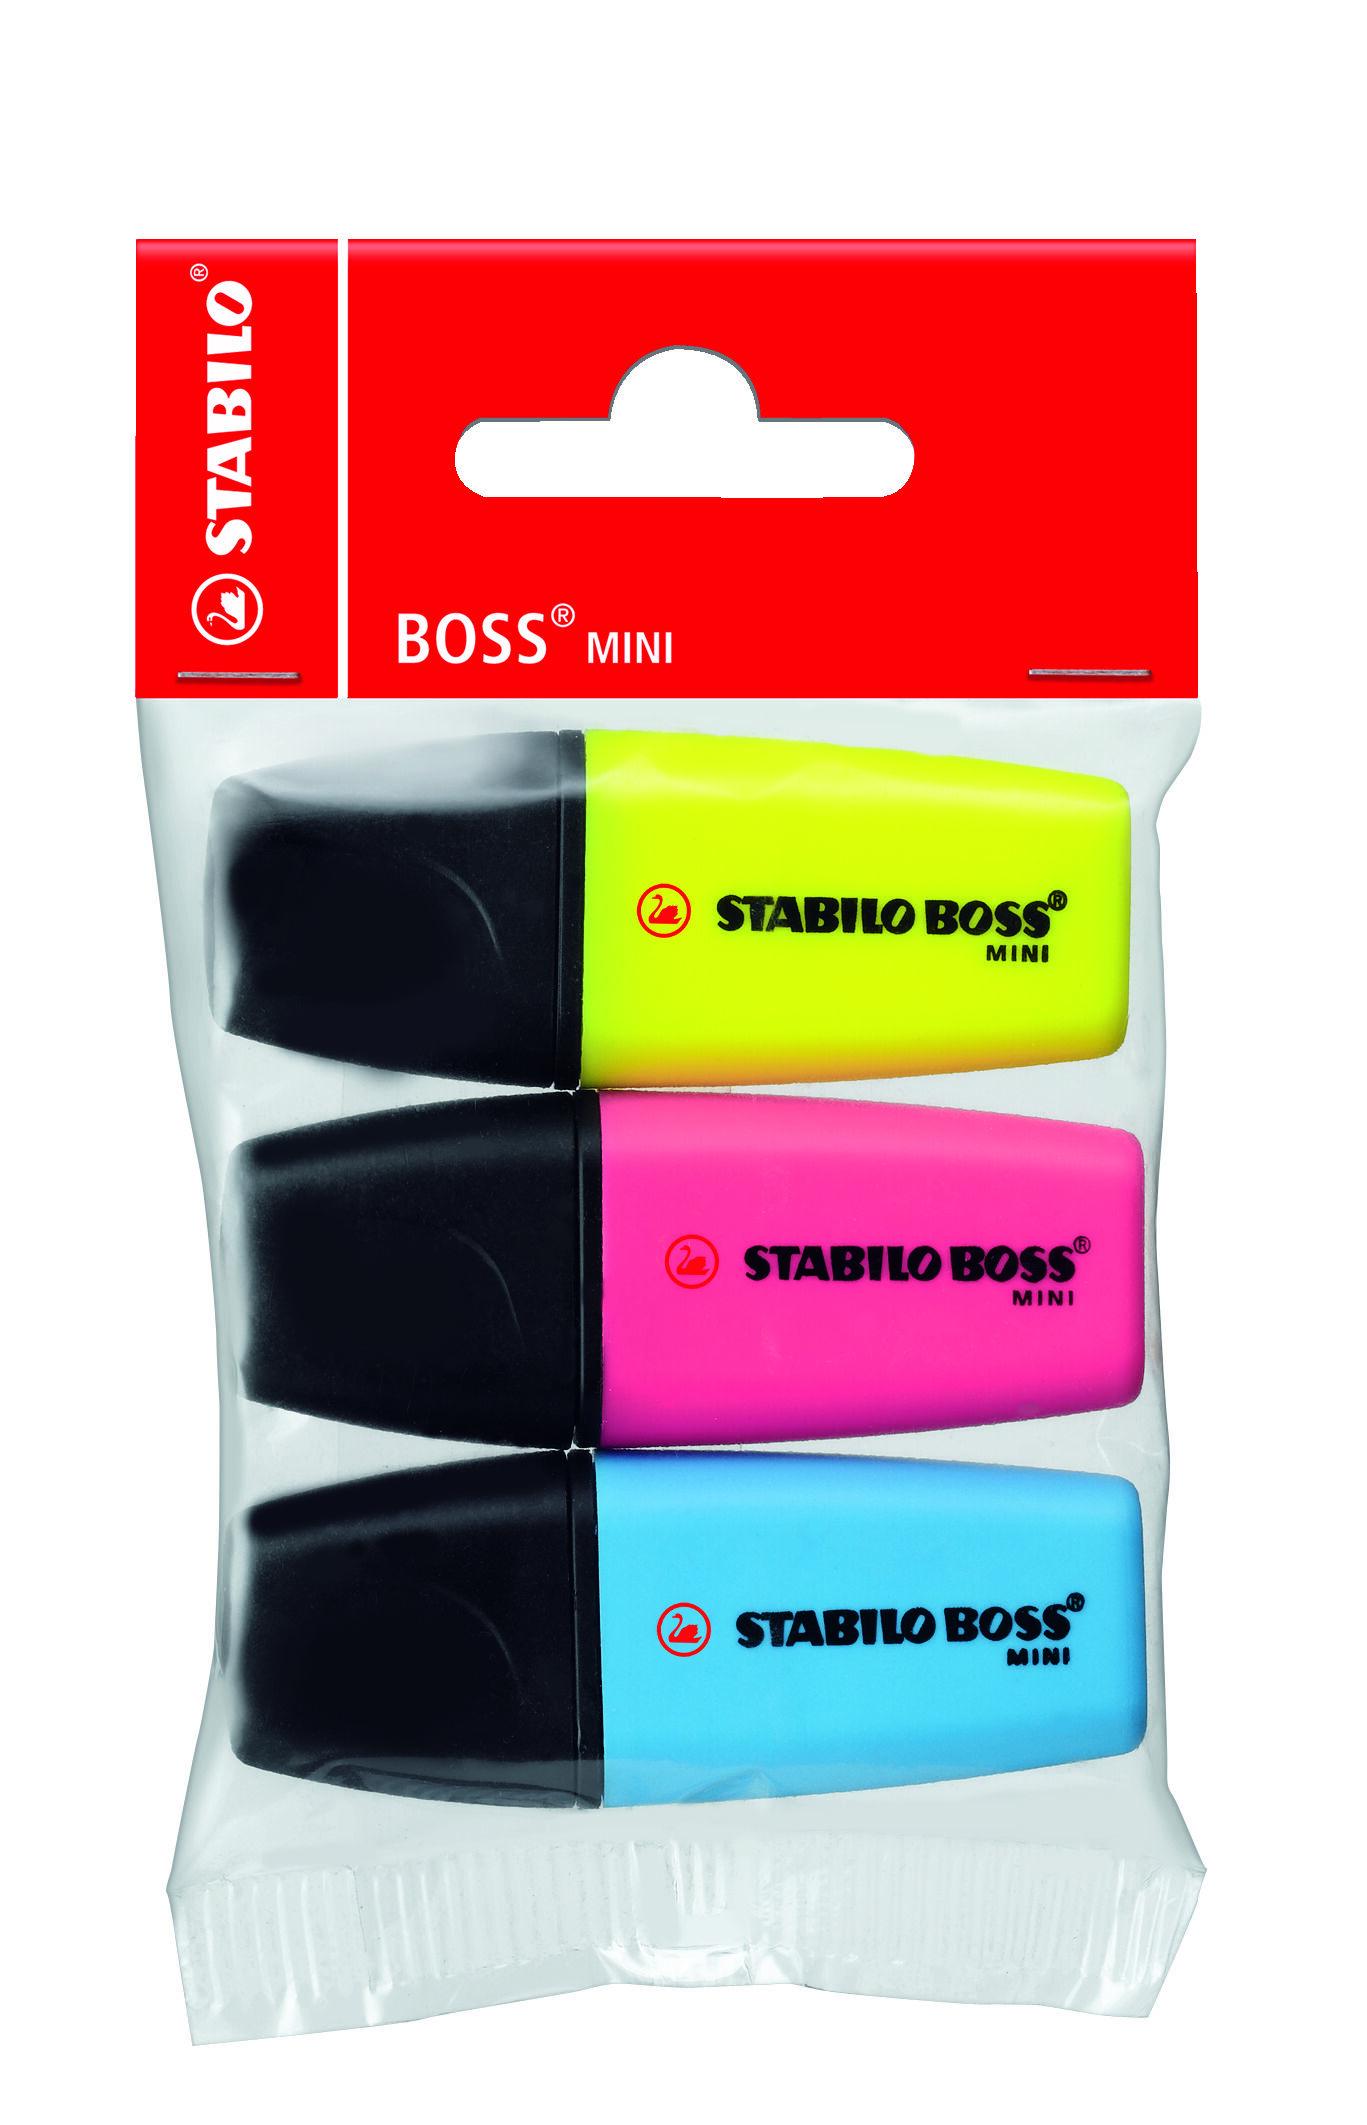 STABILO BOSS MINI - Pack de 3 surligneurs - rose, jaune, bleu